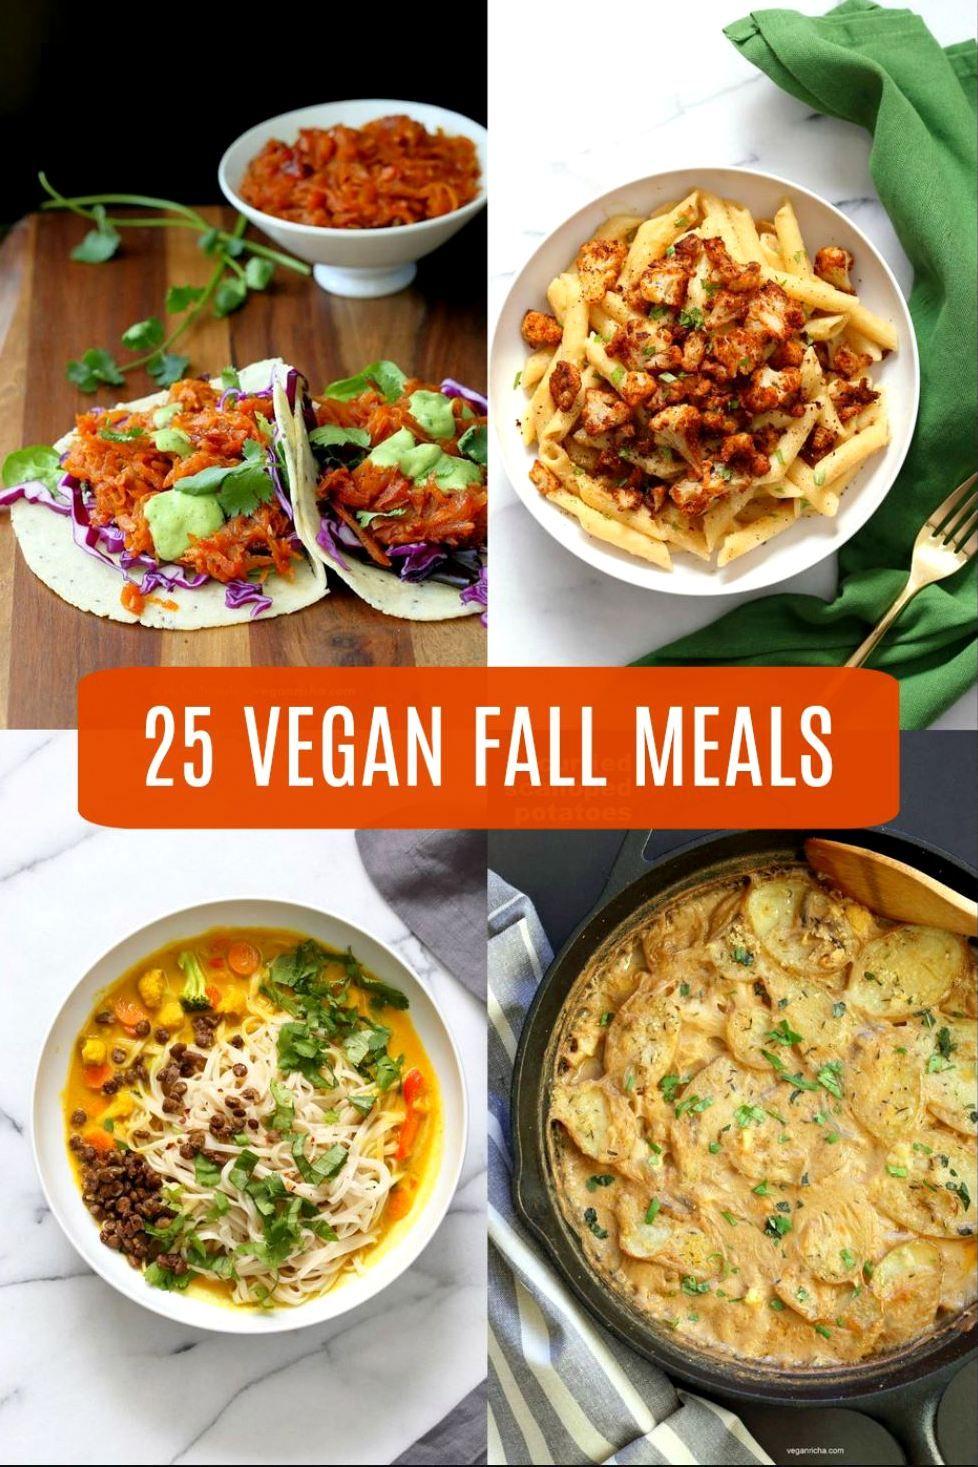 25 Vegan Fall Dinners For A Chilly Day 1 Pot Gluten Free Options Vegan Richa Fall Vegan Recipes Fall Recipes Vegan Recipes